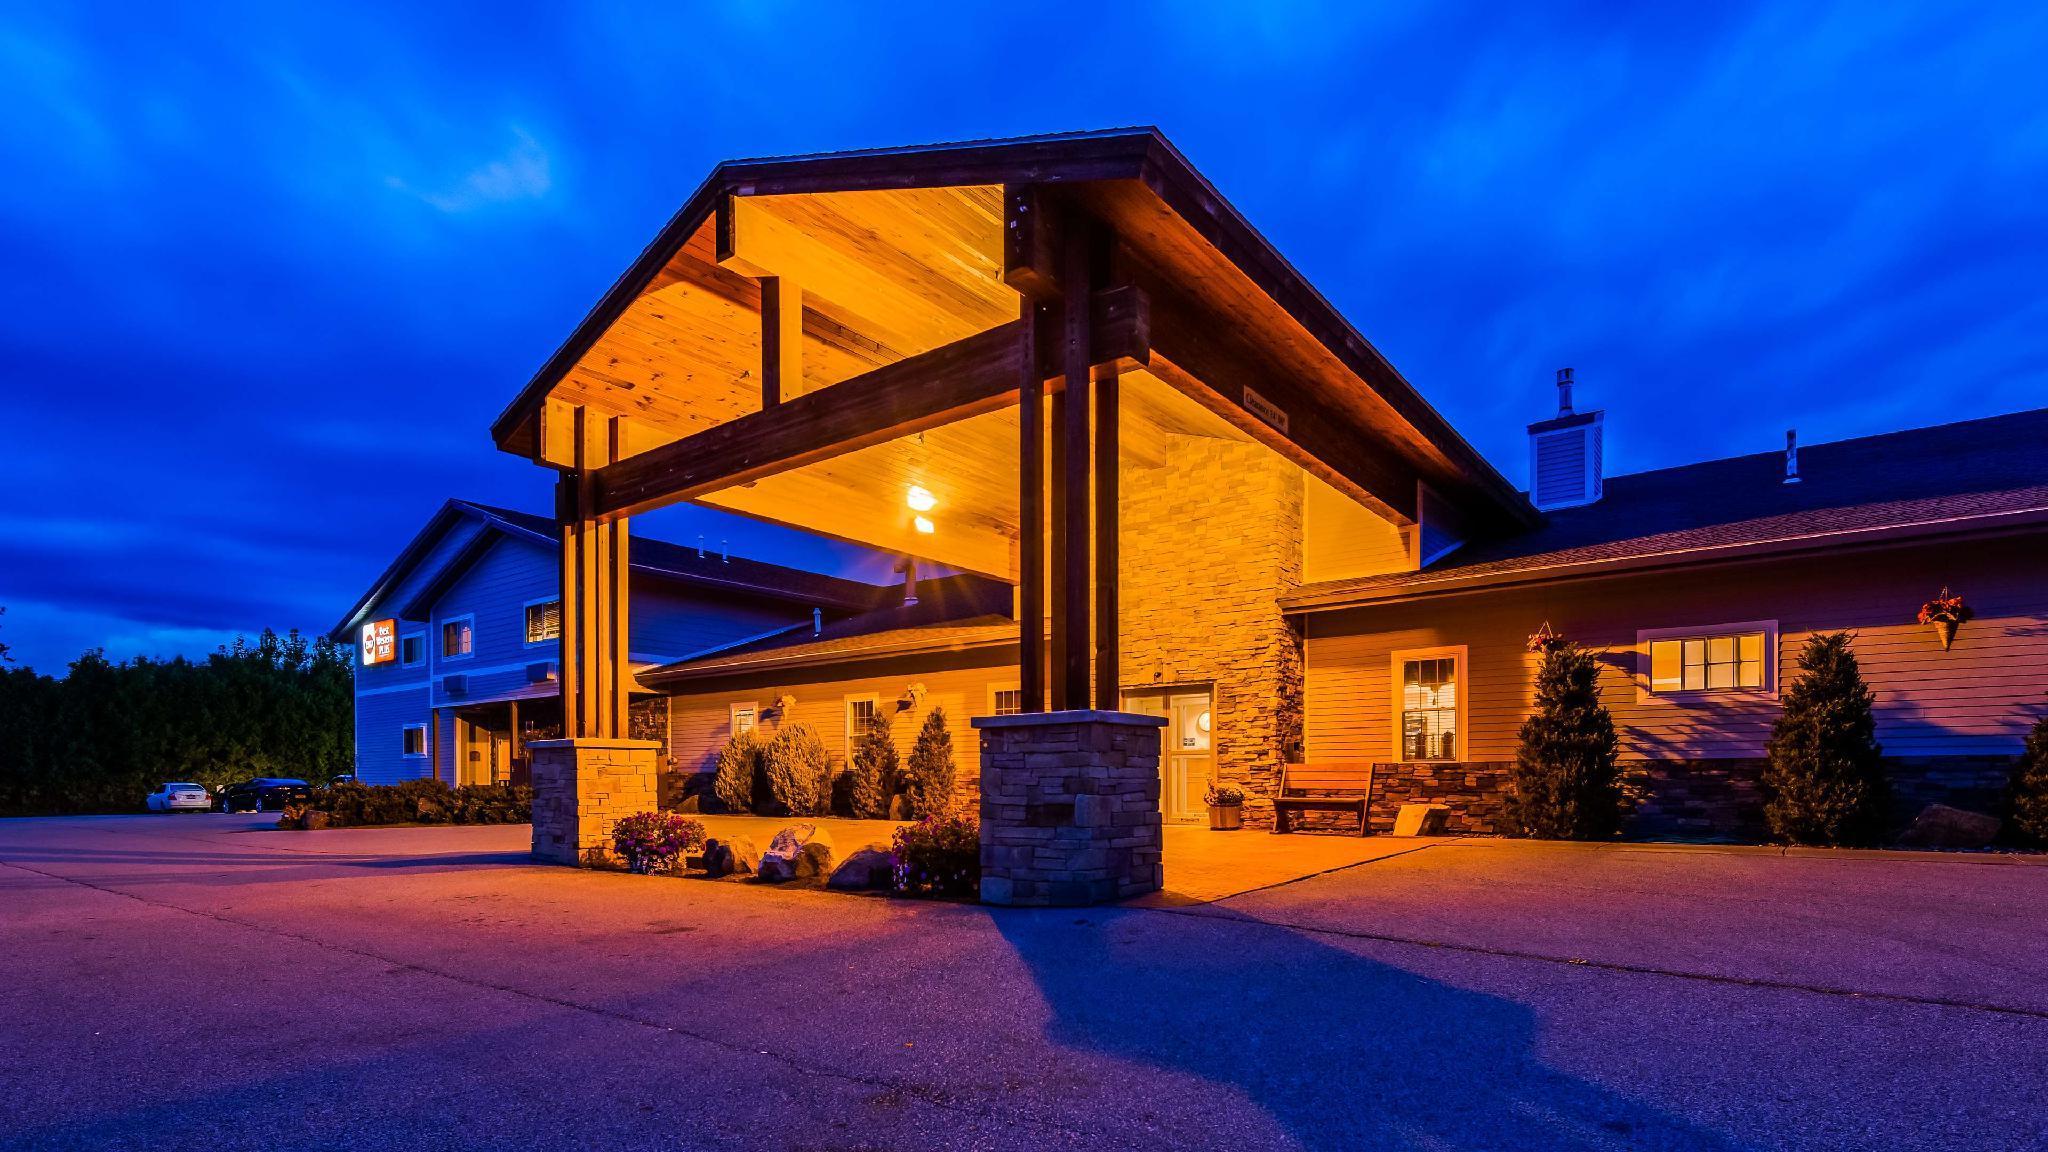 Best Western Plus Ticonderoga Inn And Suites